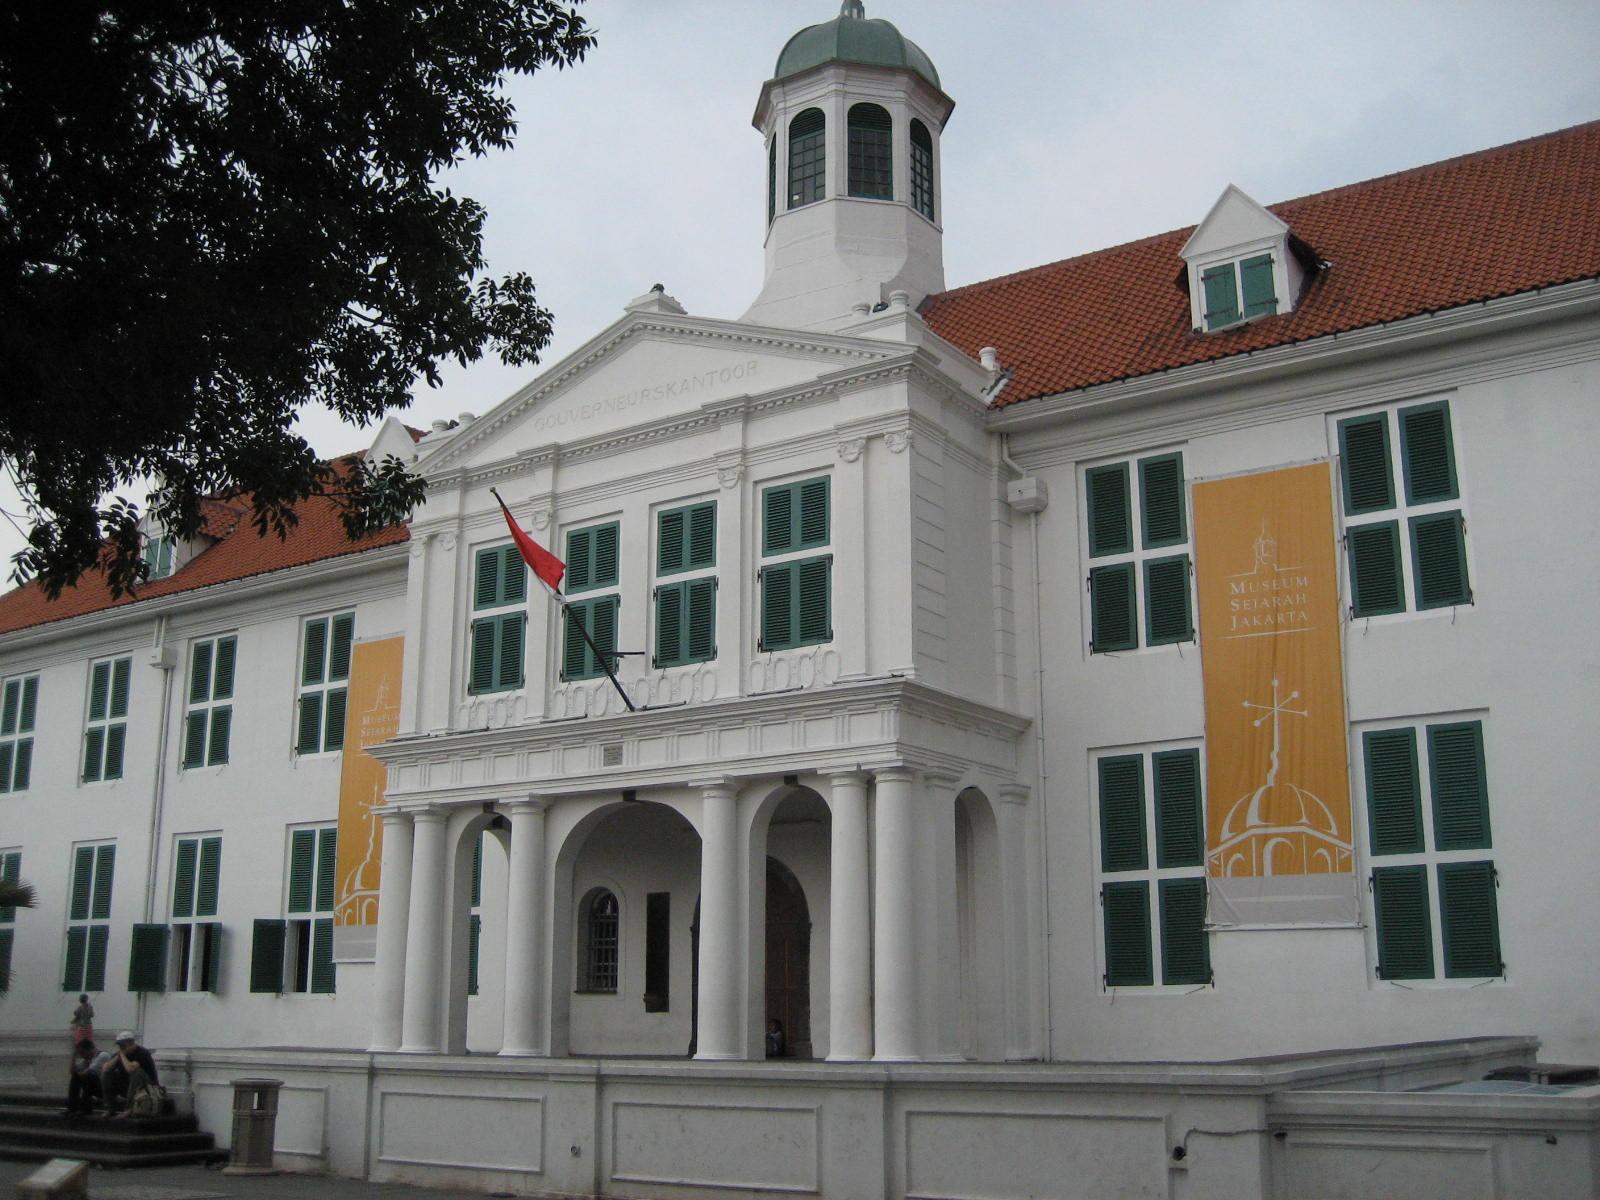 Sedikit Pencerahan Mengenai Wisata Kota Tua Washo Blog Museum Fatahillah